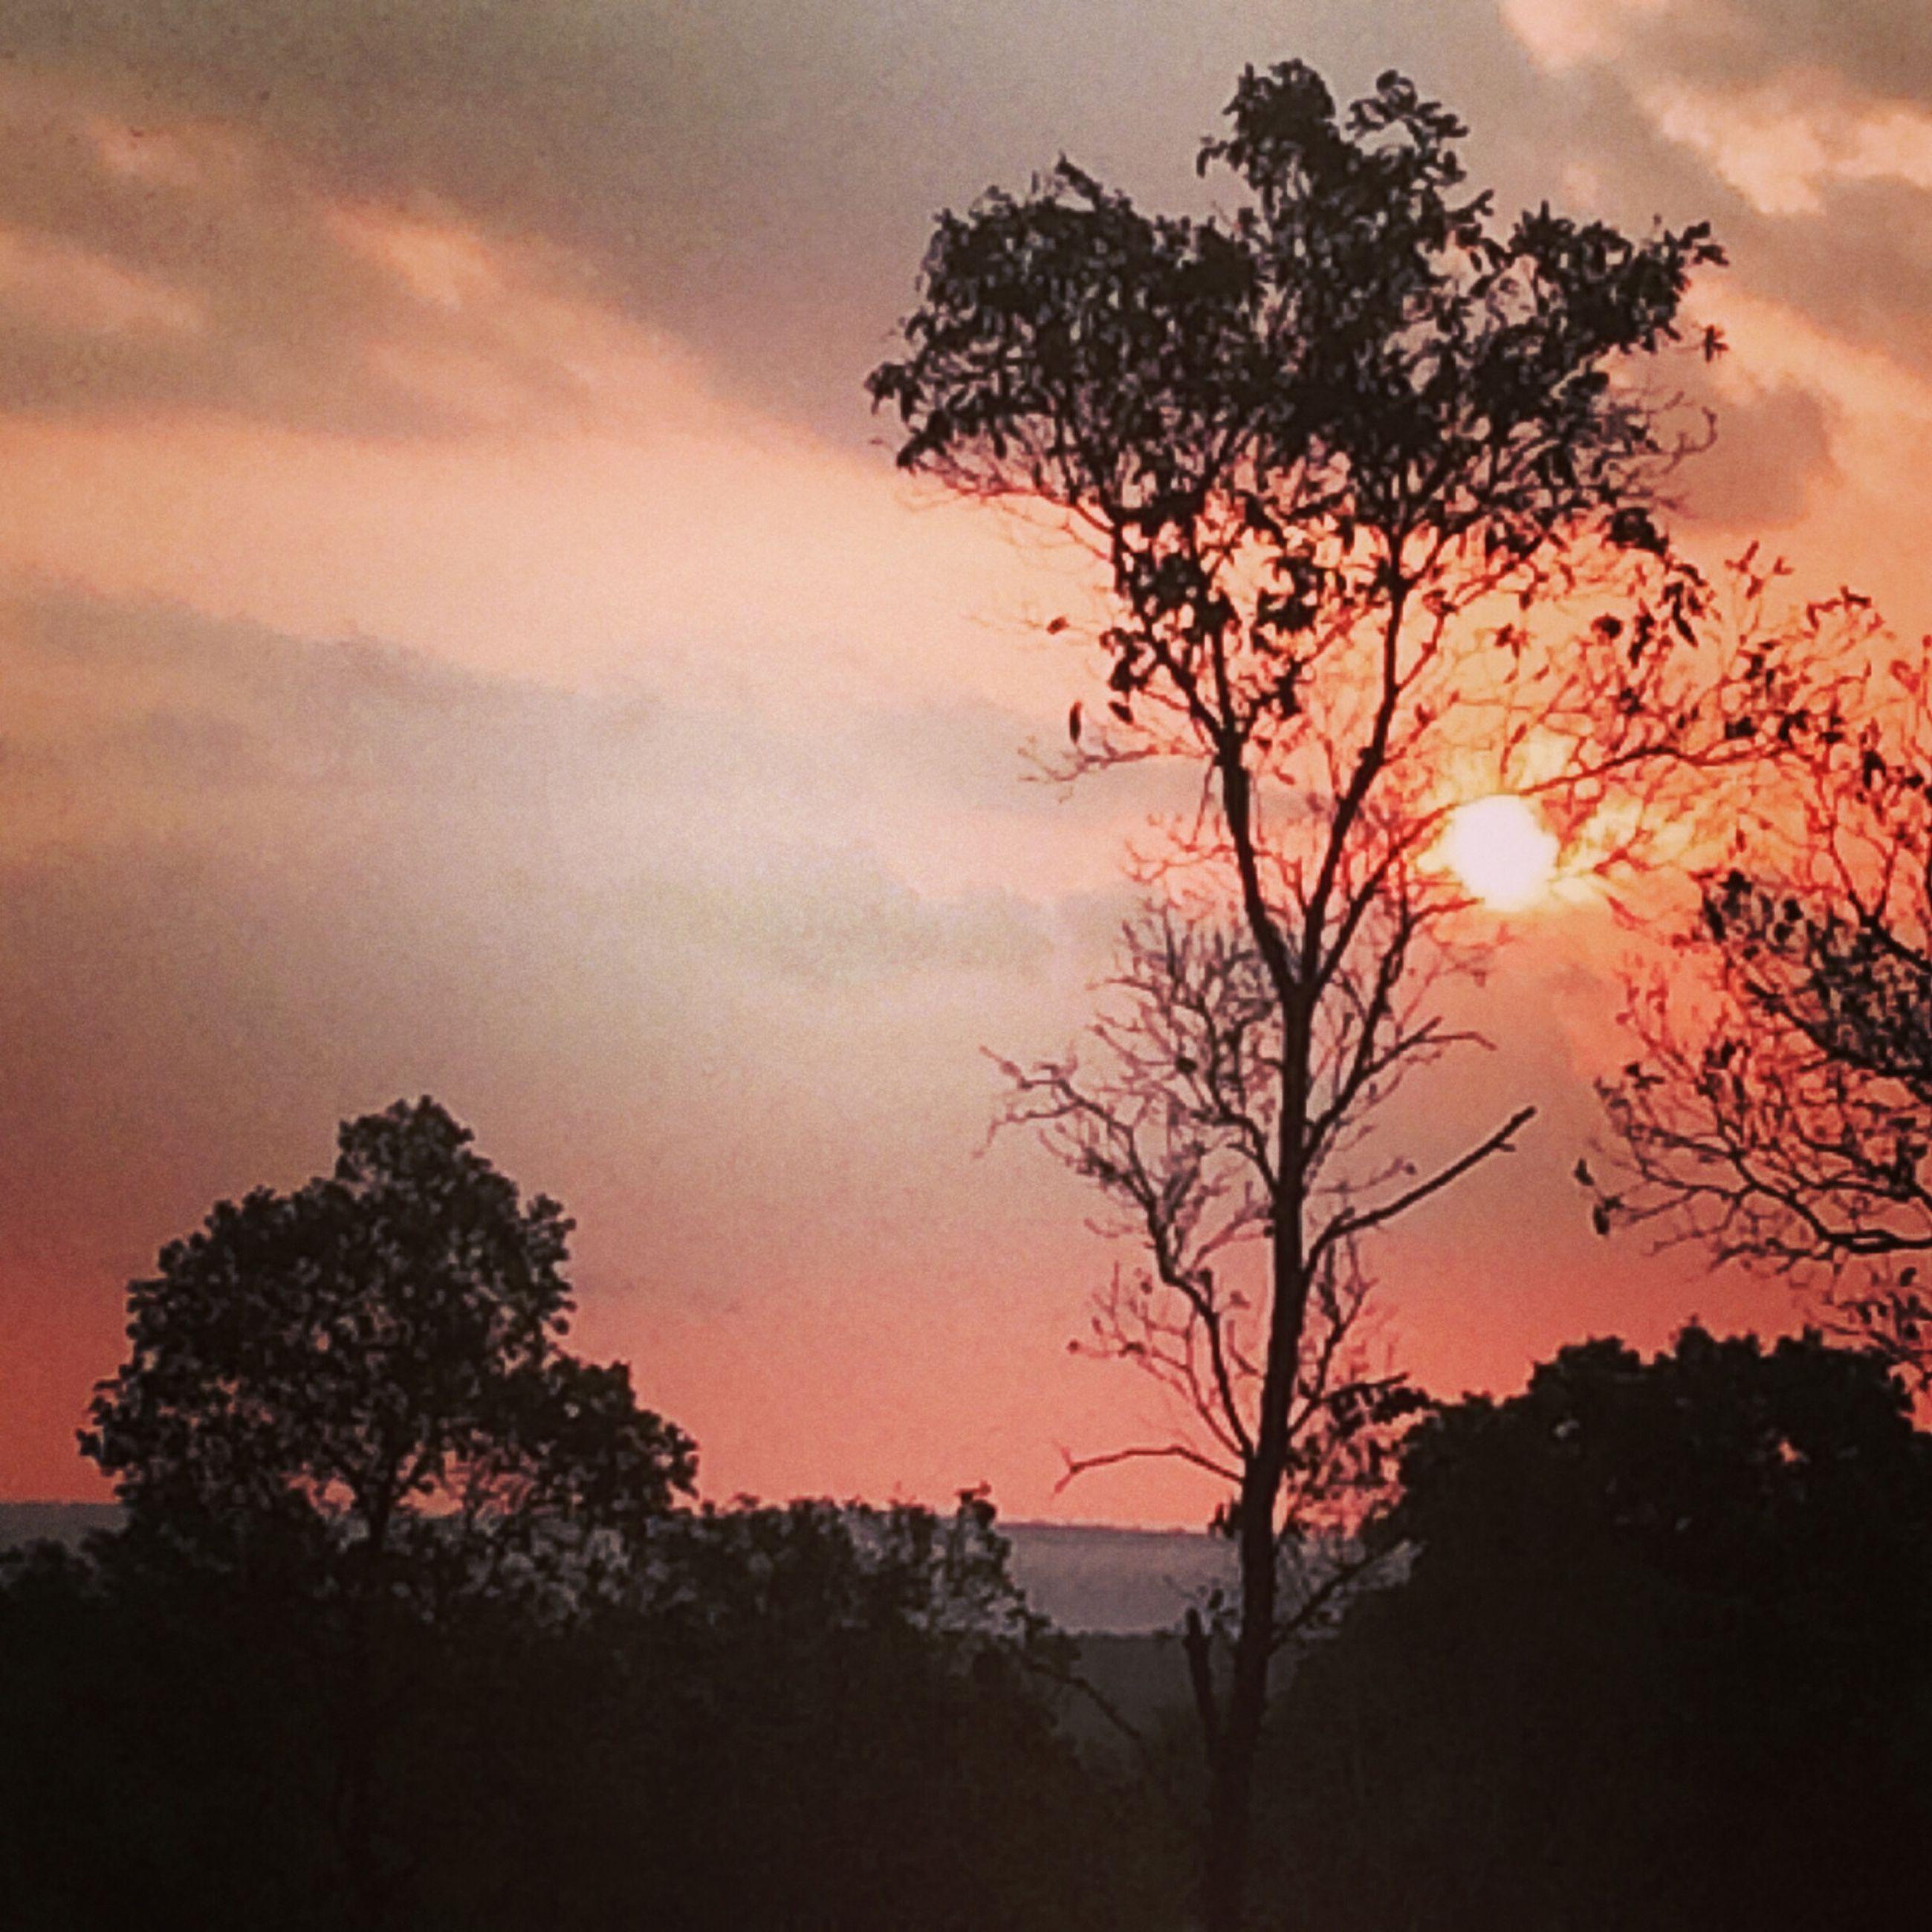 sunset, tree, silhouette, sky, beauty in nature, scenics, tranquil scene, tranquility, sun, orange color, cloud - sky, nature, idyllic, growth, branch, sunlight, cloud, dramatic sky, outdoors, non-urban scene